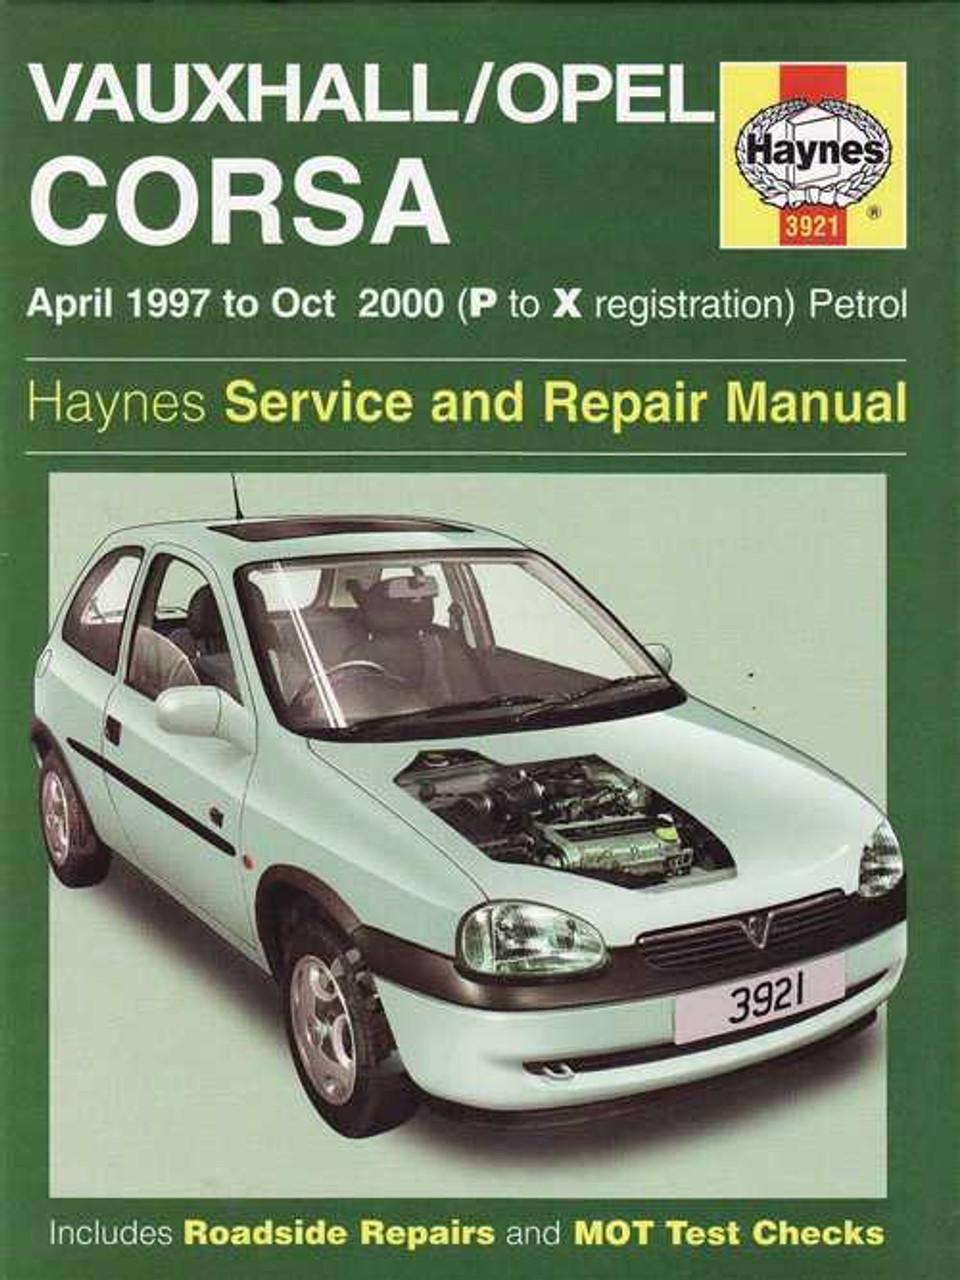 holden barina vauxhall opel corsa petrol 1997 2000 workshop manual rh automotobookshop com au holden sb barina workshop manual Holden Barina Hatch